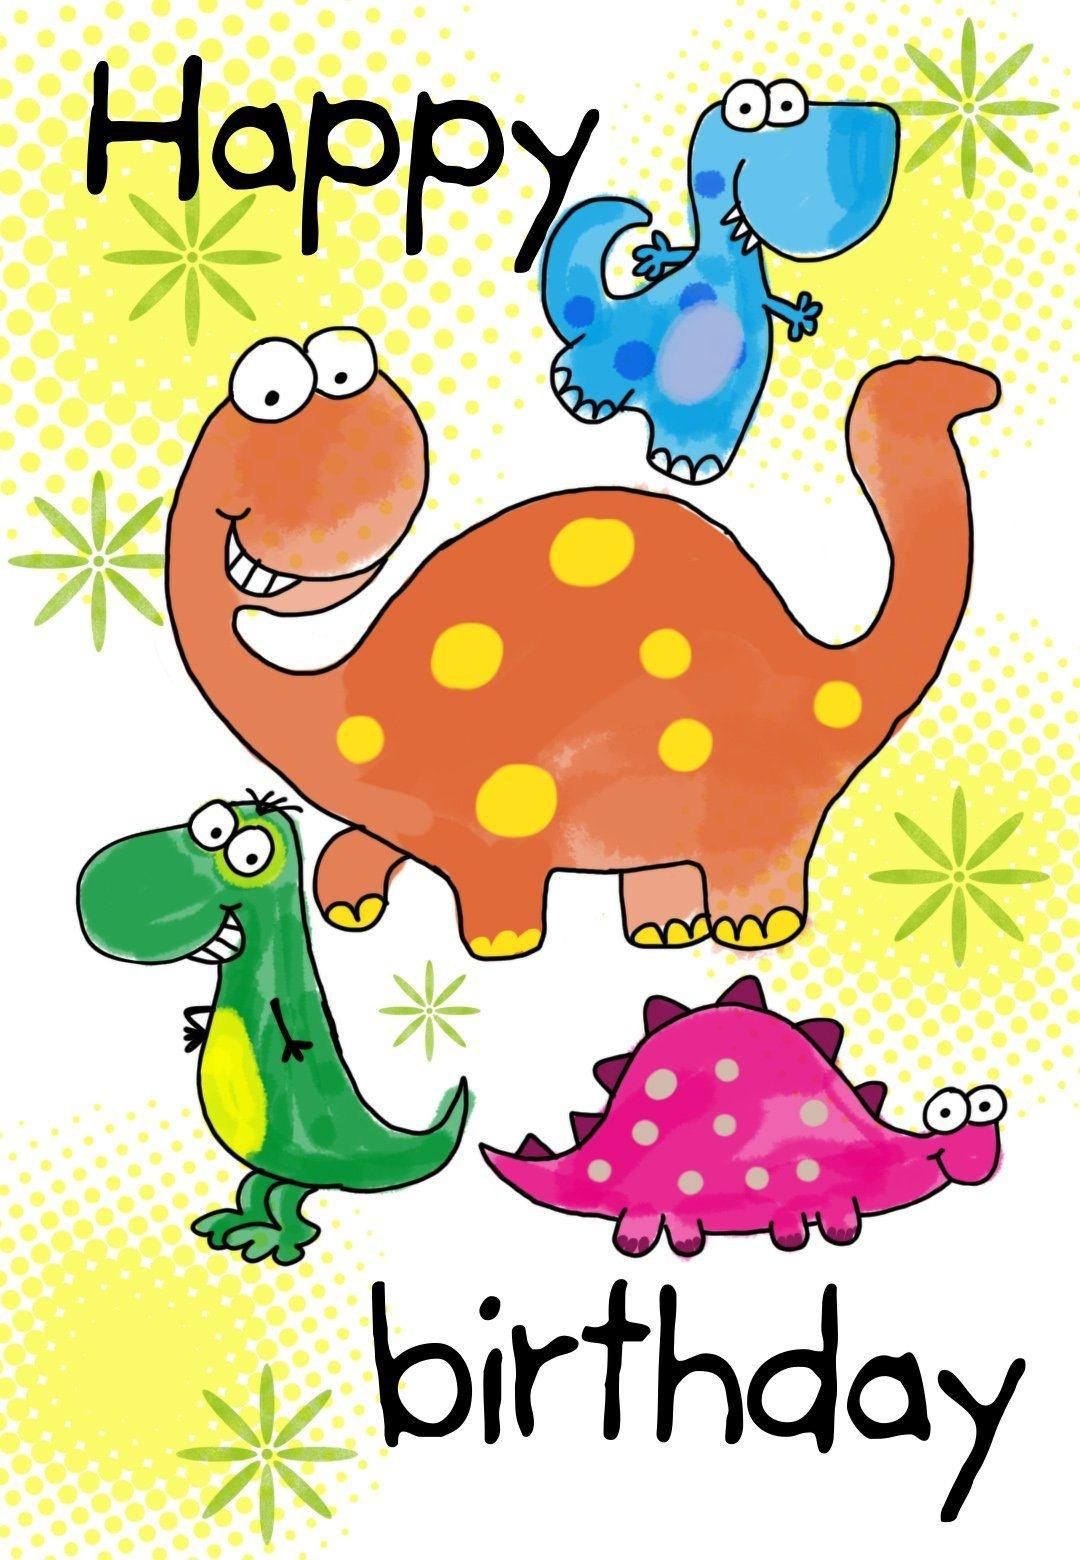 Happy Birthday Dinosaurs - Free Printable Birthday Card | Greetings - Free Printable Kids Birthday Cards Boys